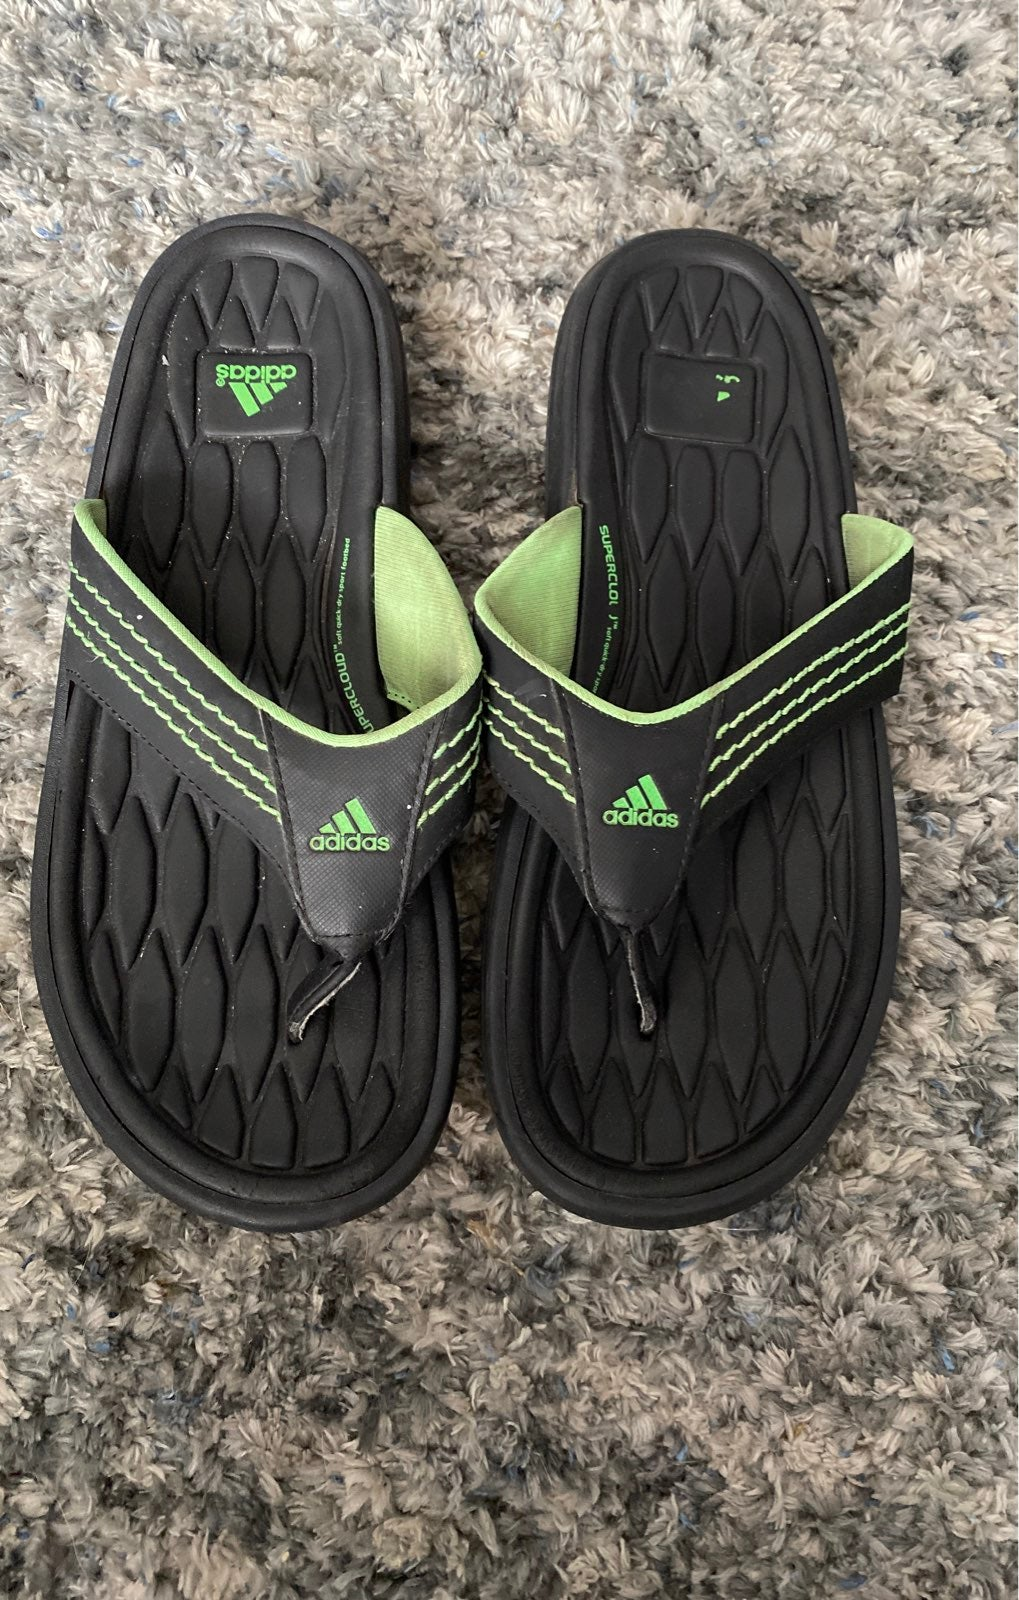 Adidas Flops size 6